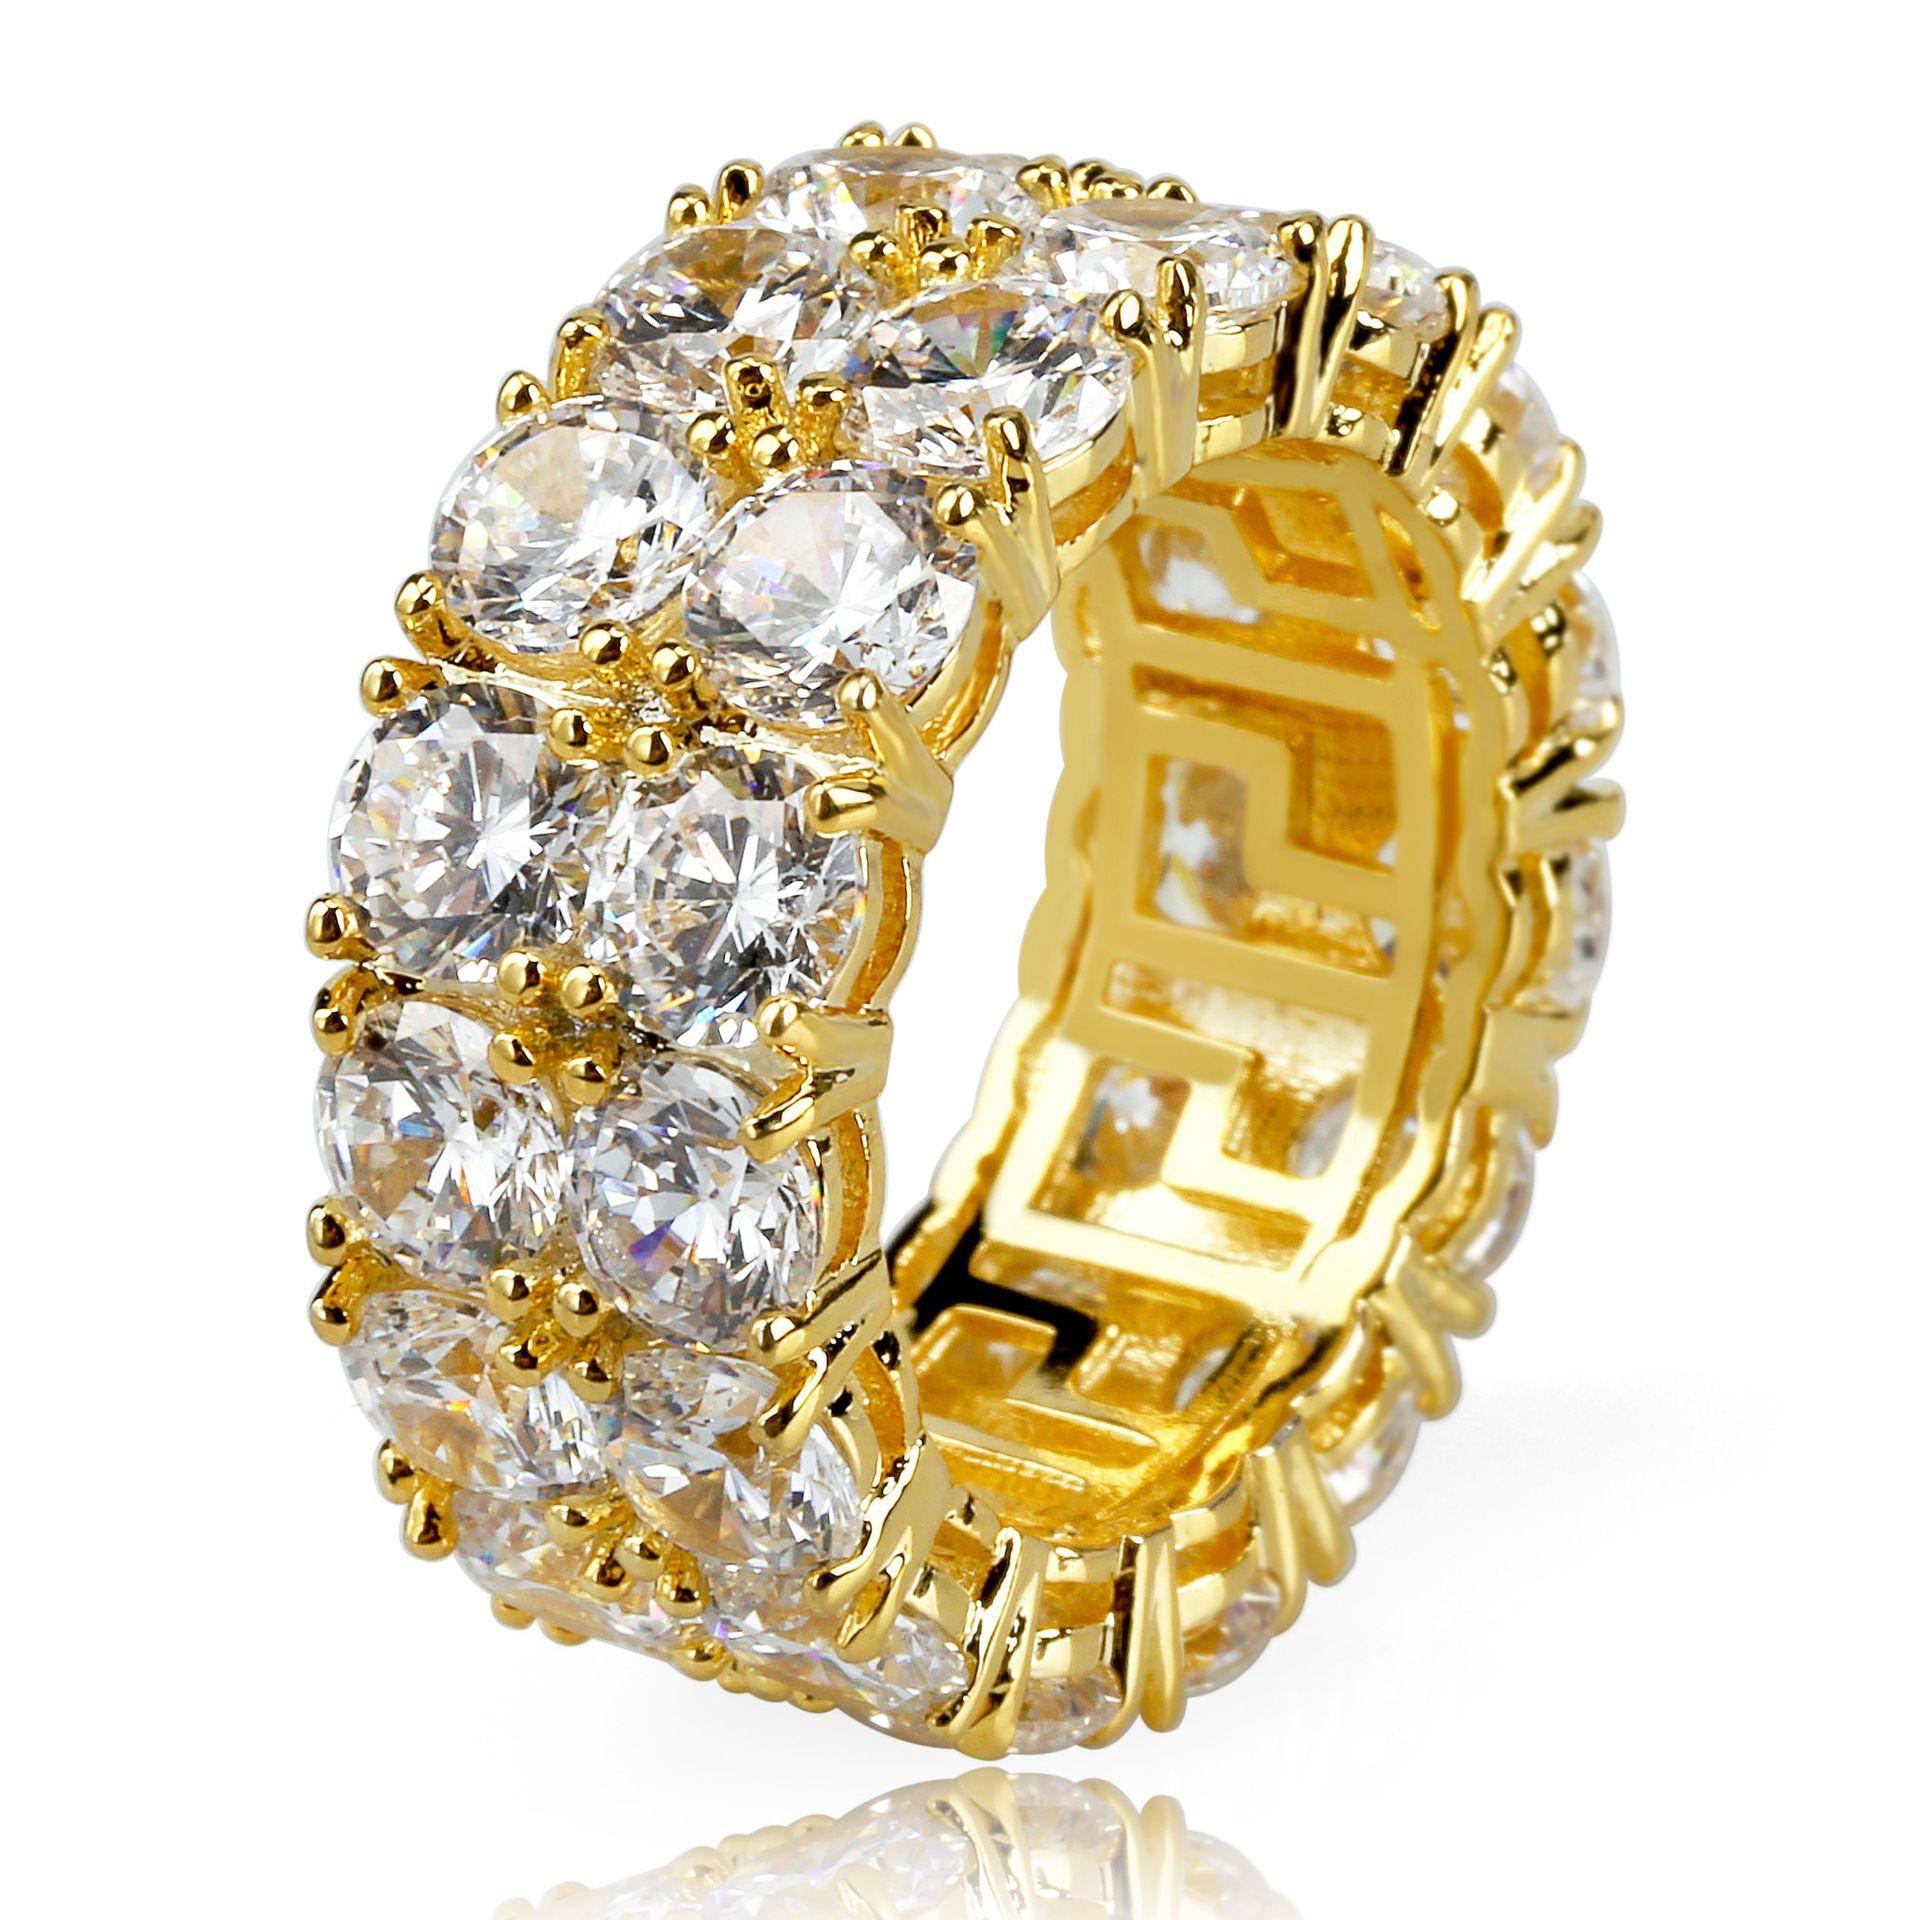 7-12 Gold Silver Plated Cor Anéis Micro pavimentada 2 Row Tênis Anéis Zircon Hip Hop dedo para homens Mulheres